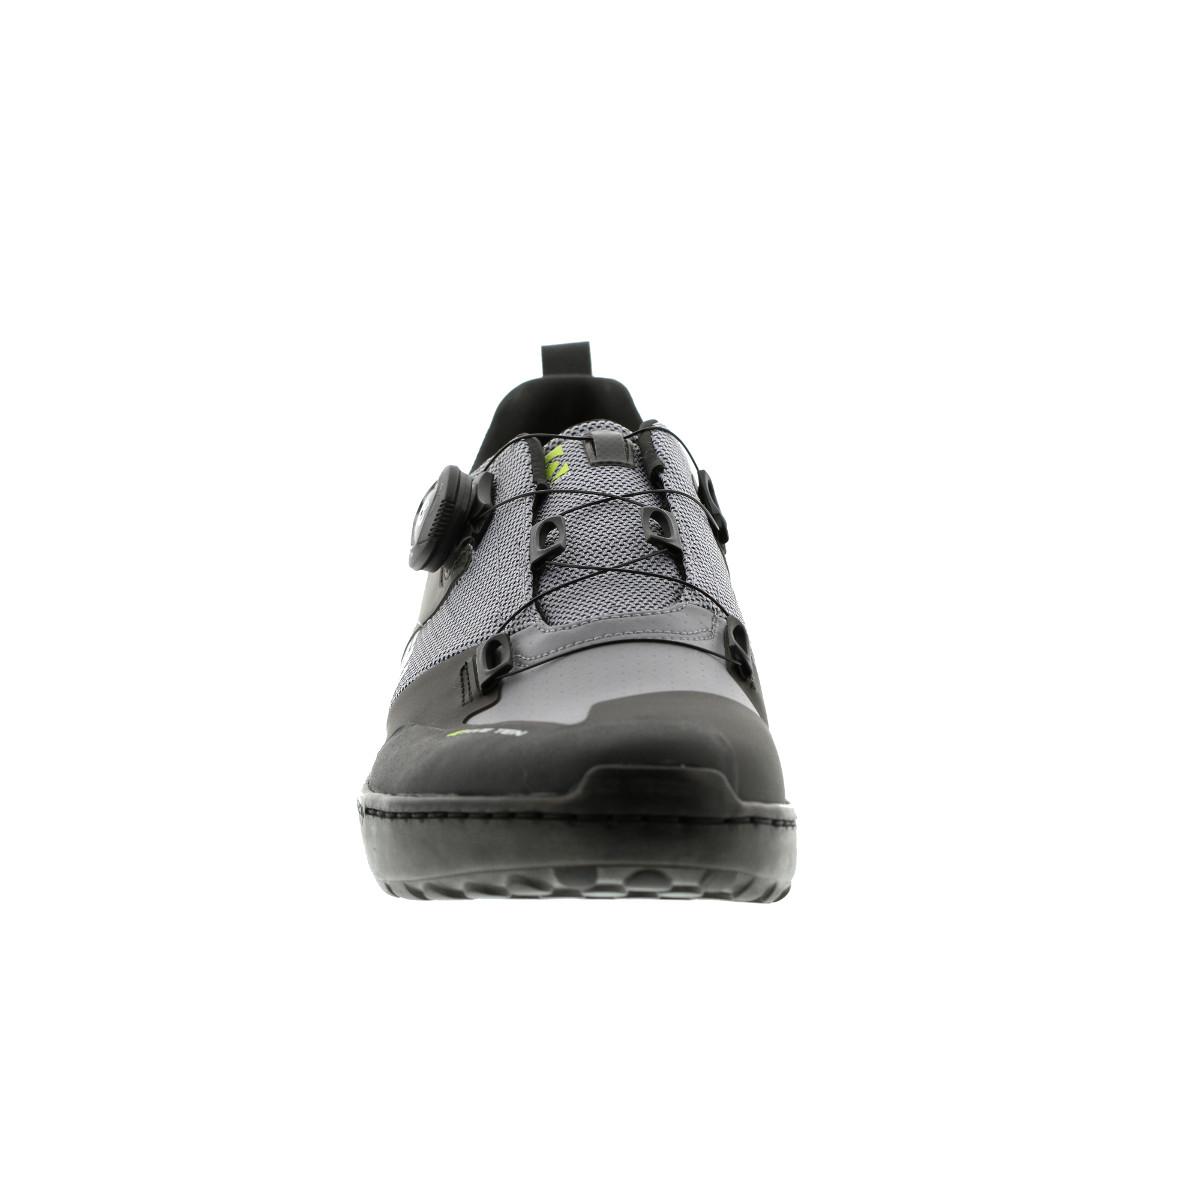 Five Ten MTB Schuhe Kestrel GrauSlime | eBay